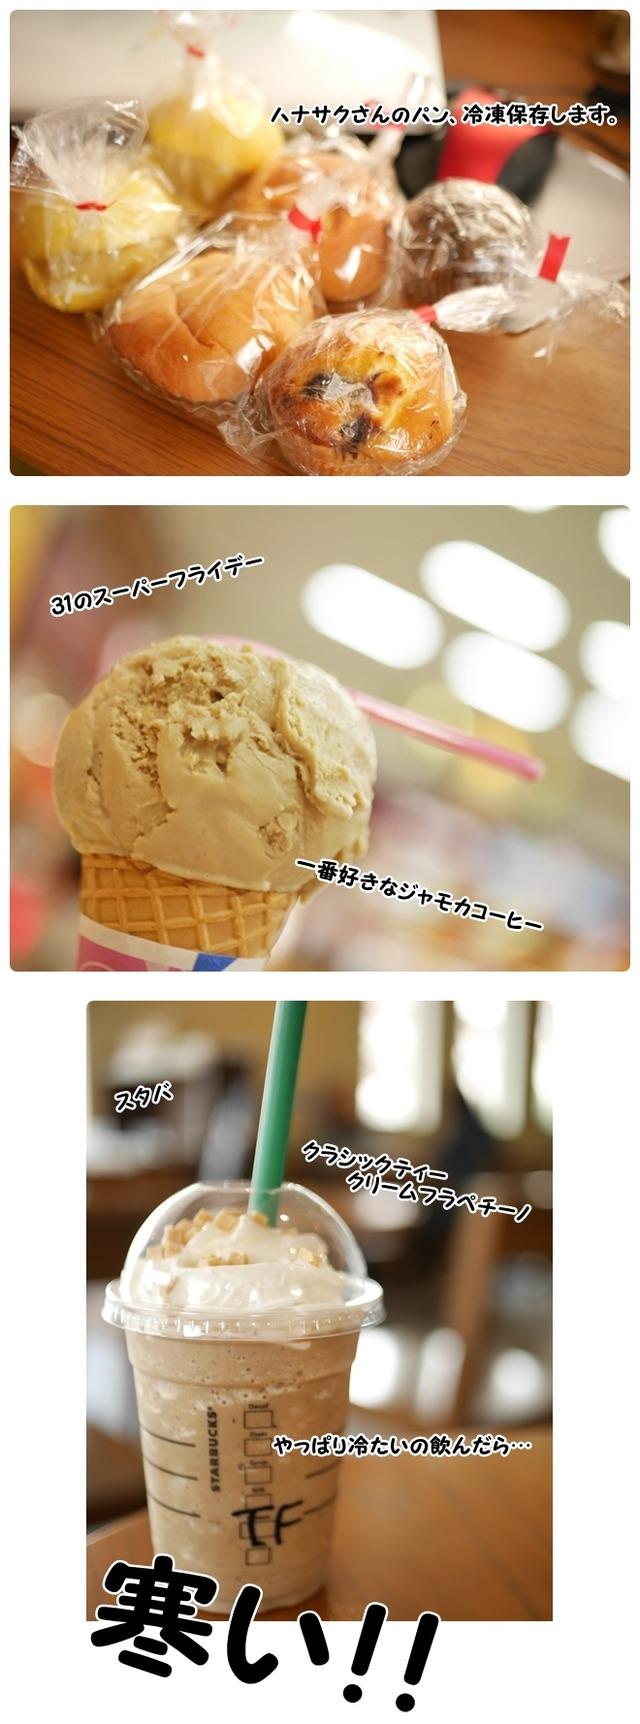 ■P1170218-vert